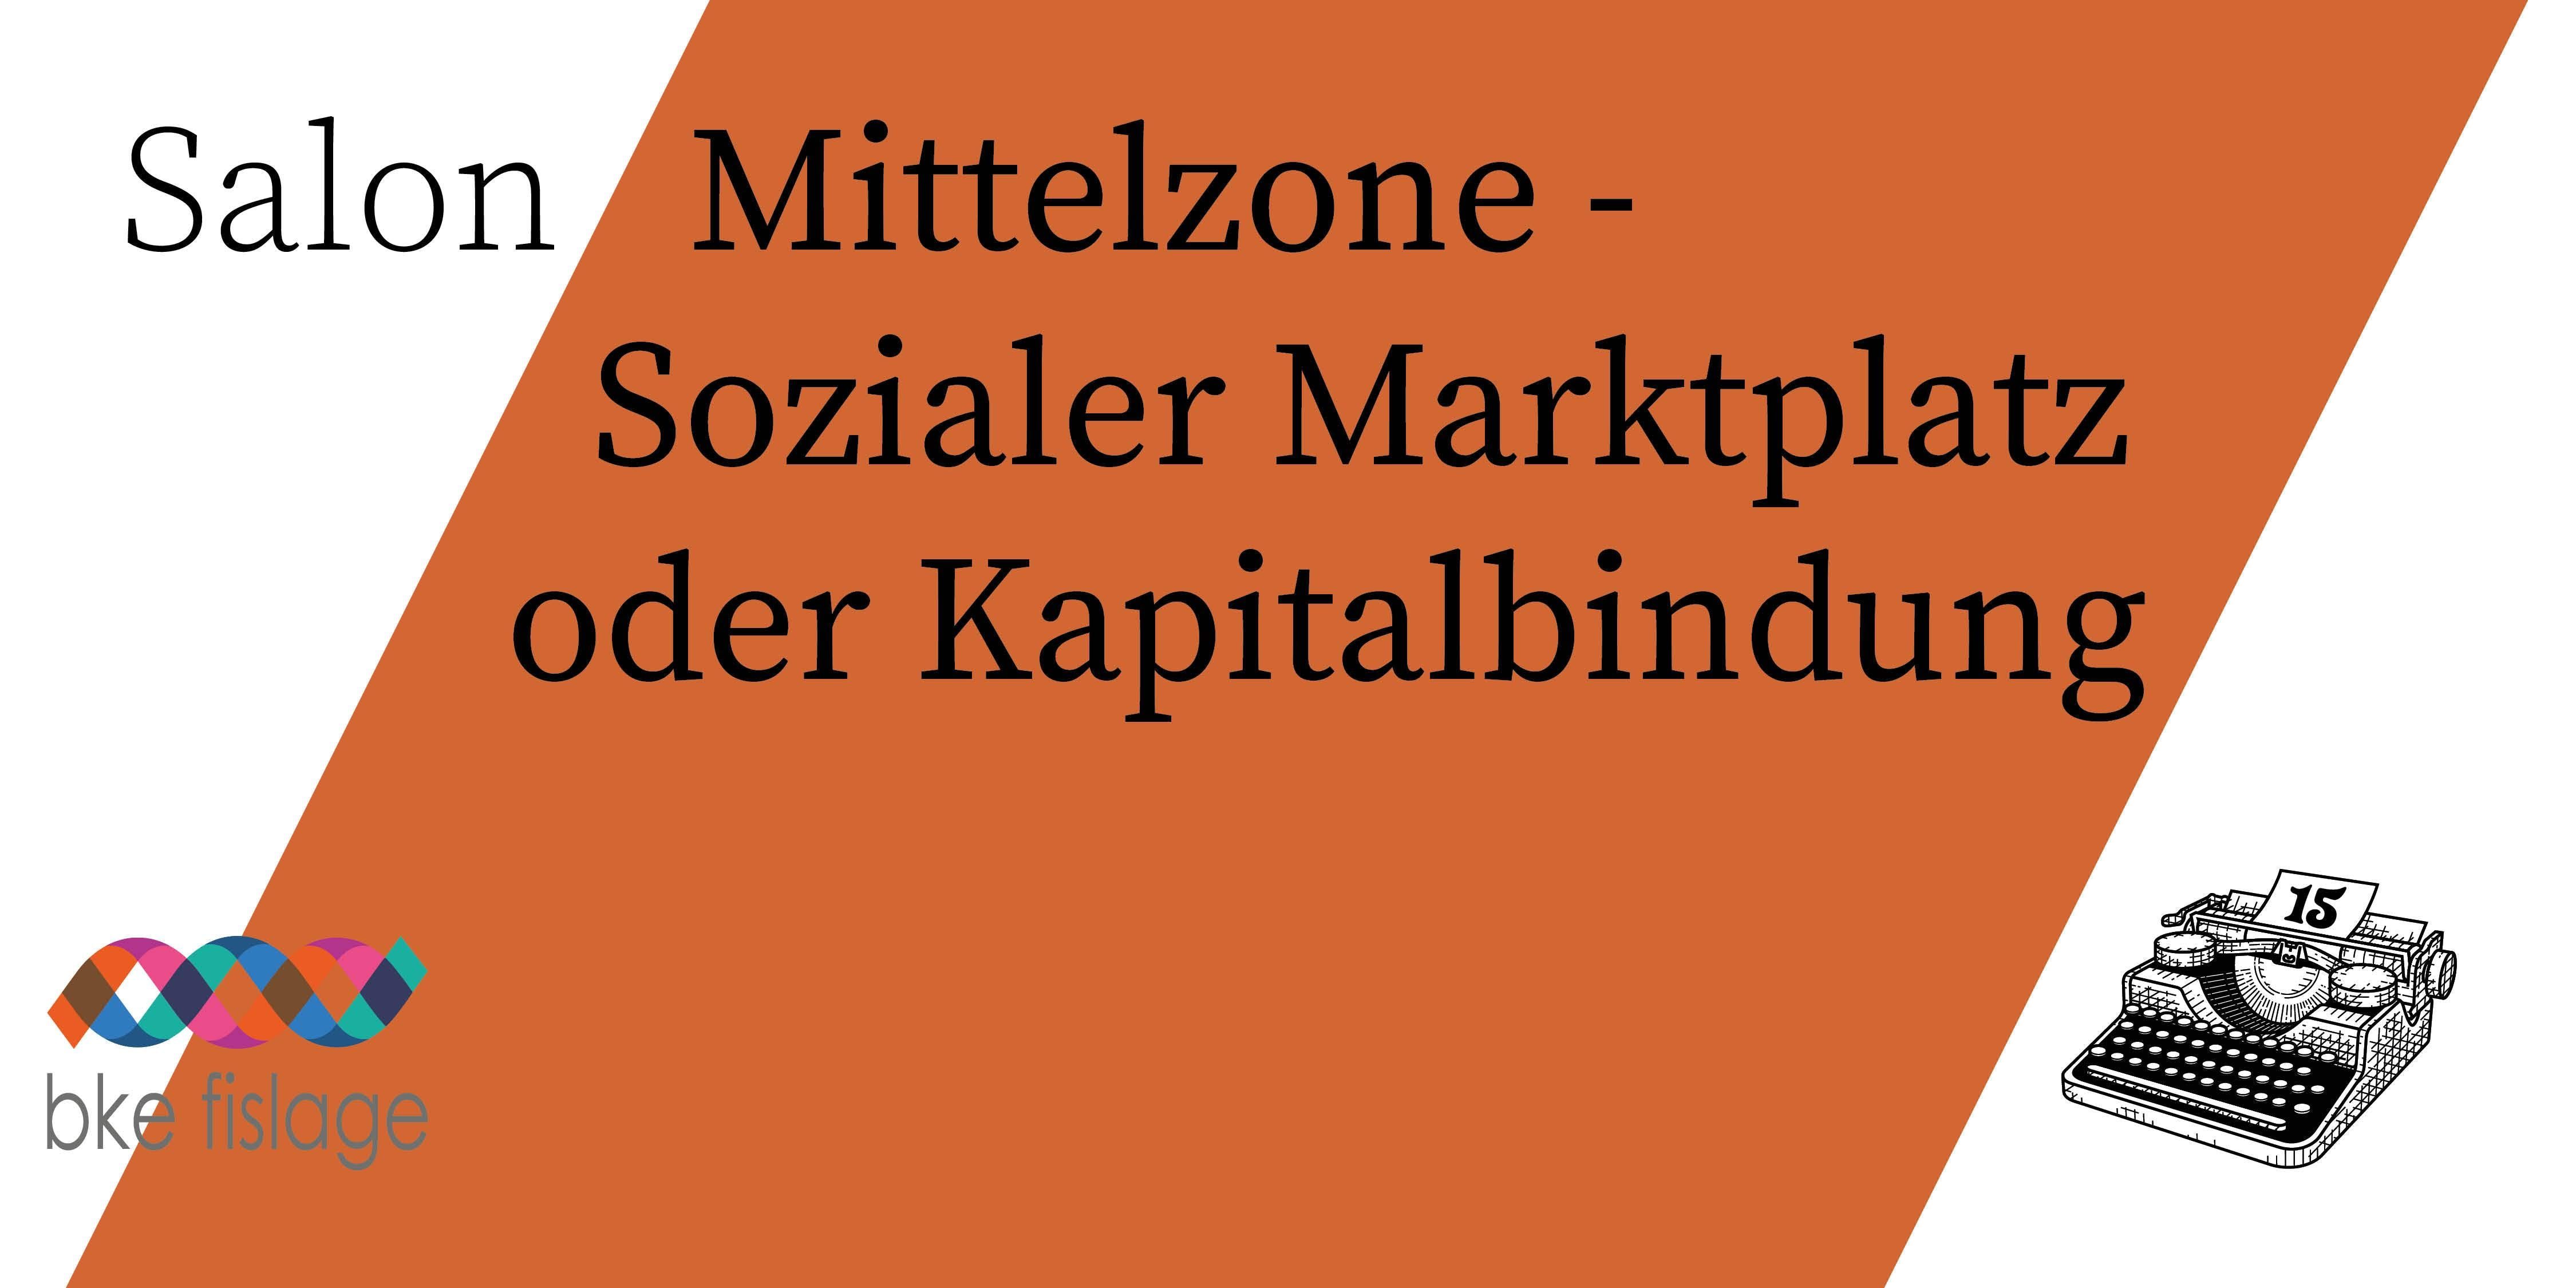 Salon Mittelzone- Sozialer Marktplatz oder Kapitalbindung